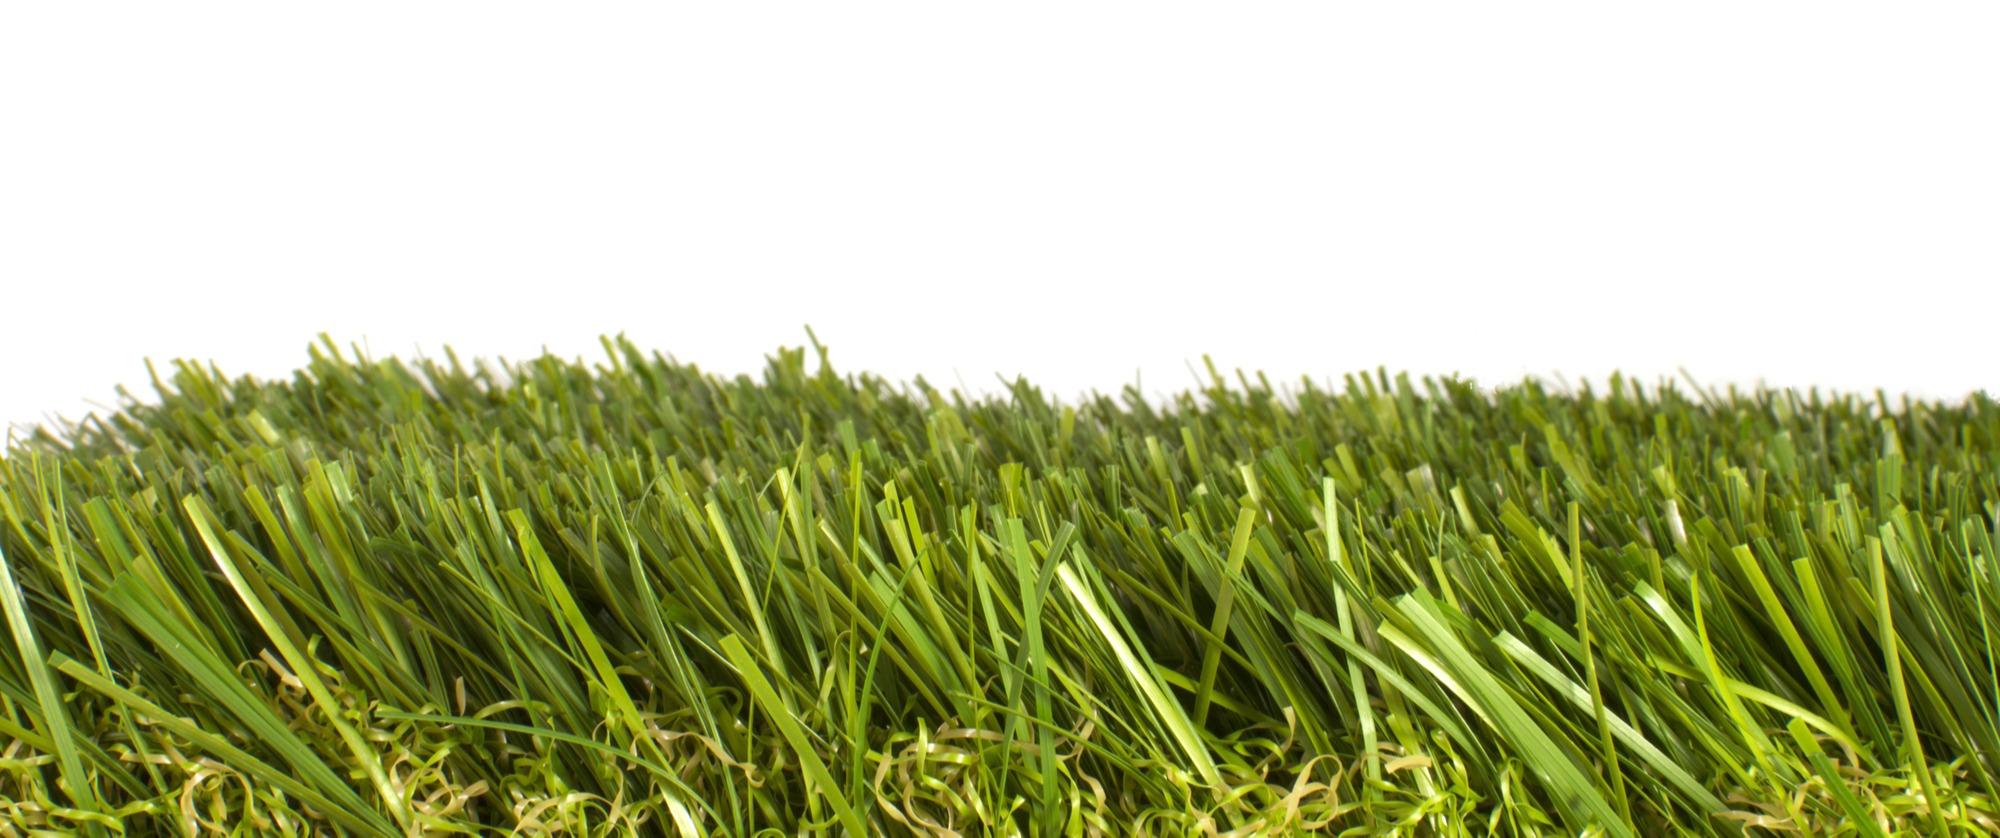 Does Artificial Grass Get Mold